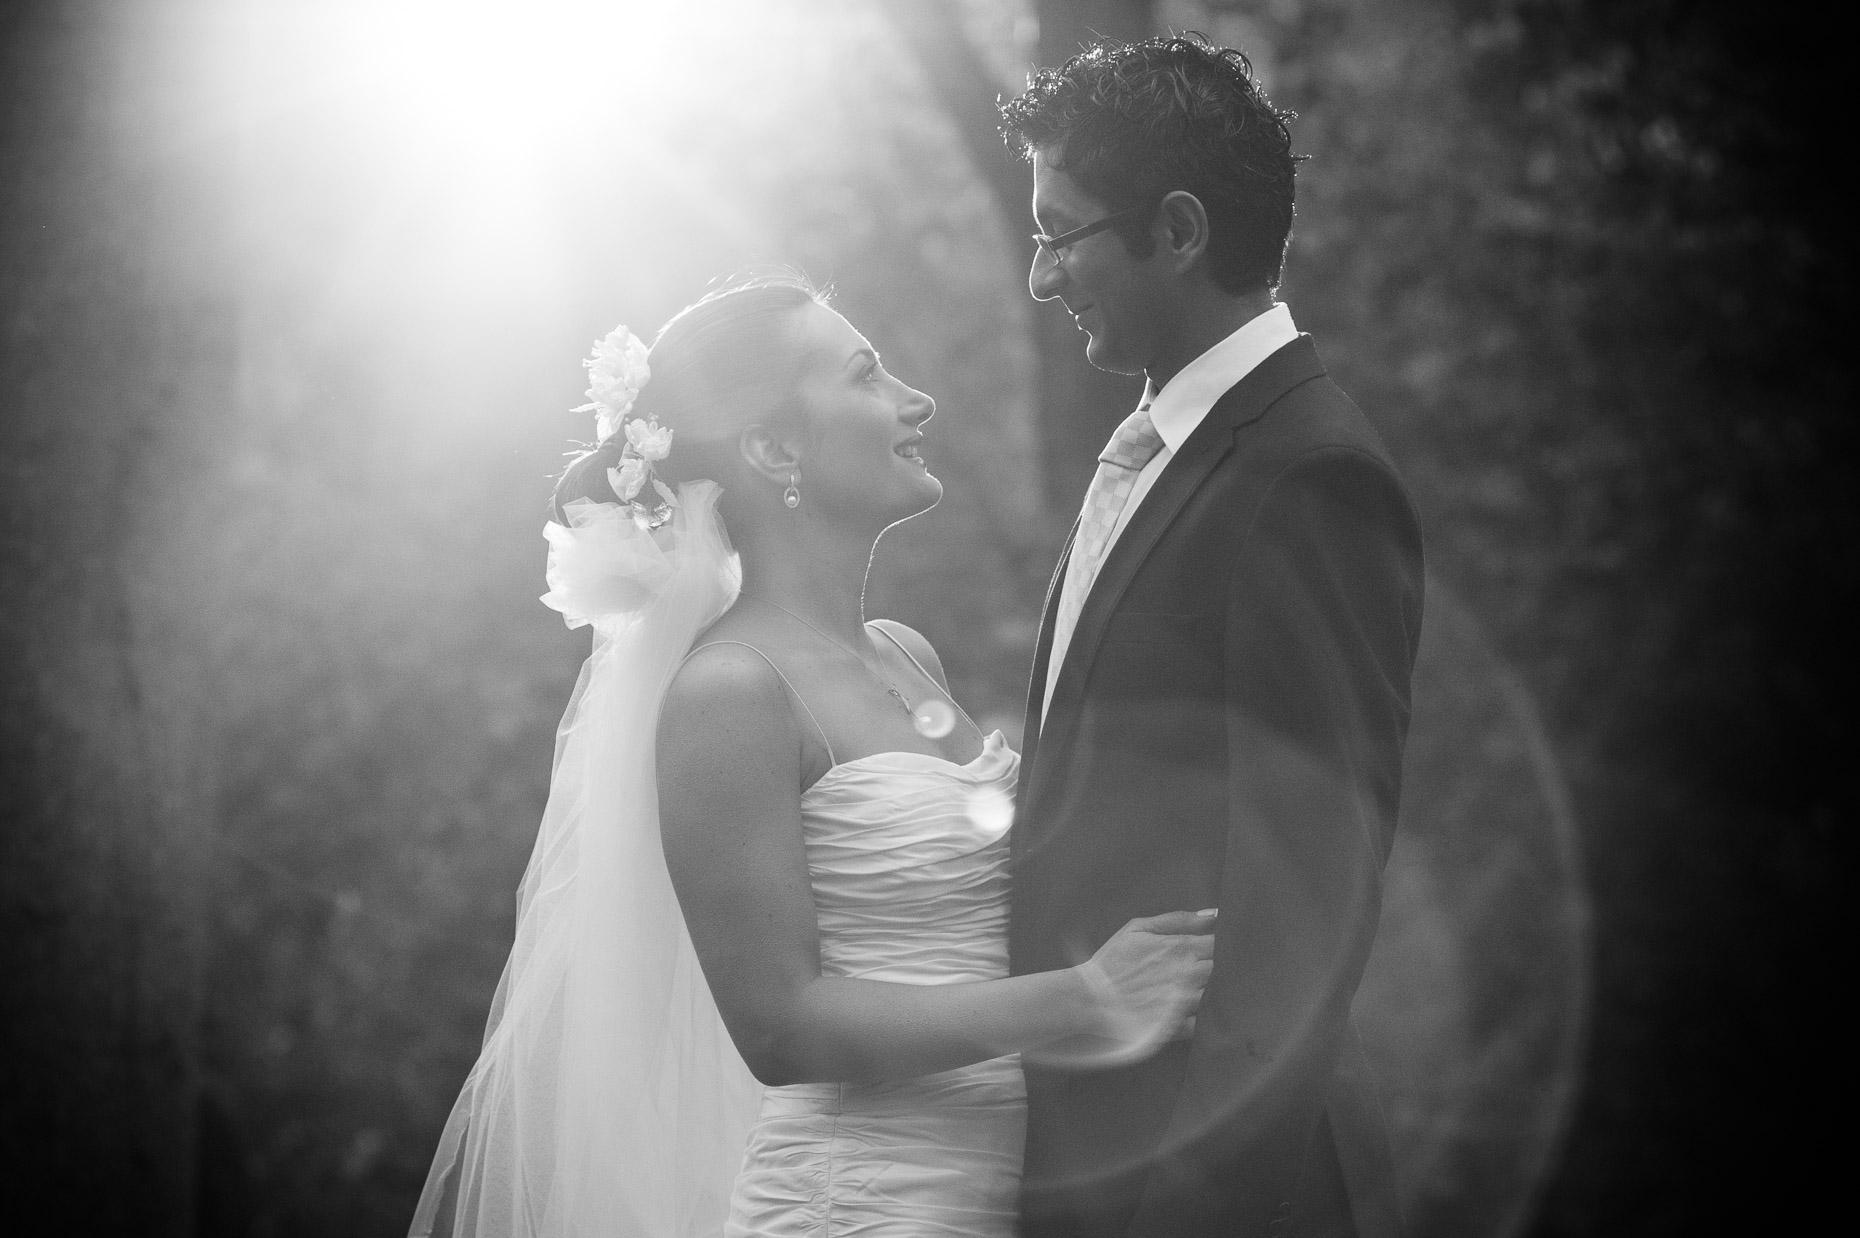 Weddings by Elliott O'Donovan - Washington DC_-12.jpg